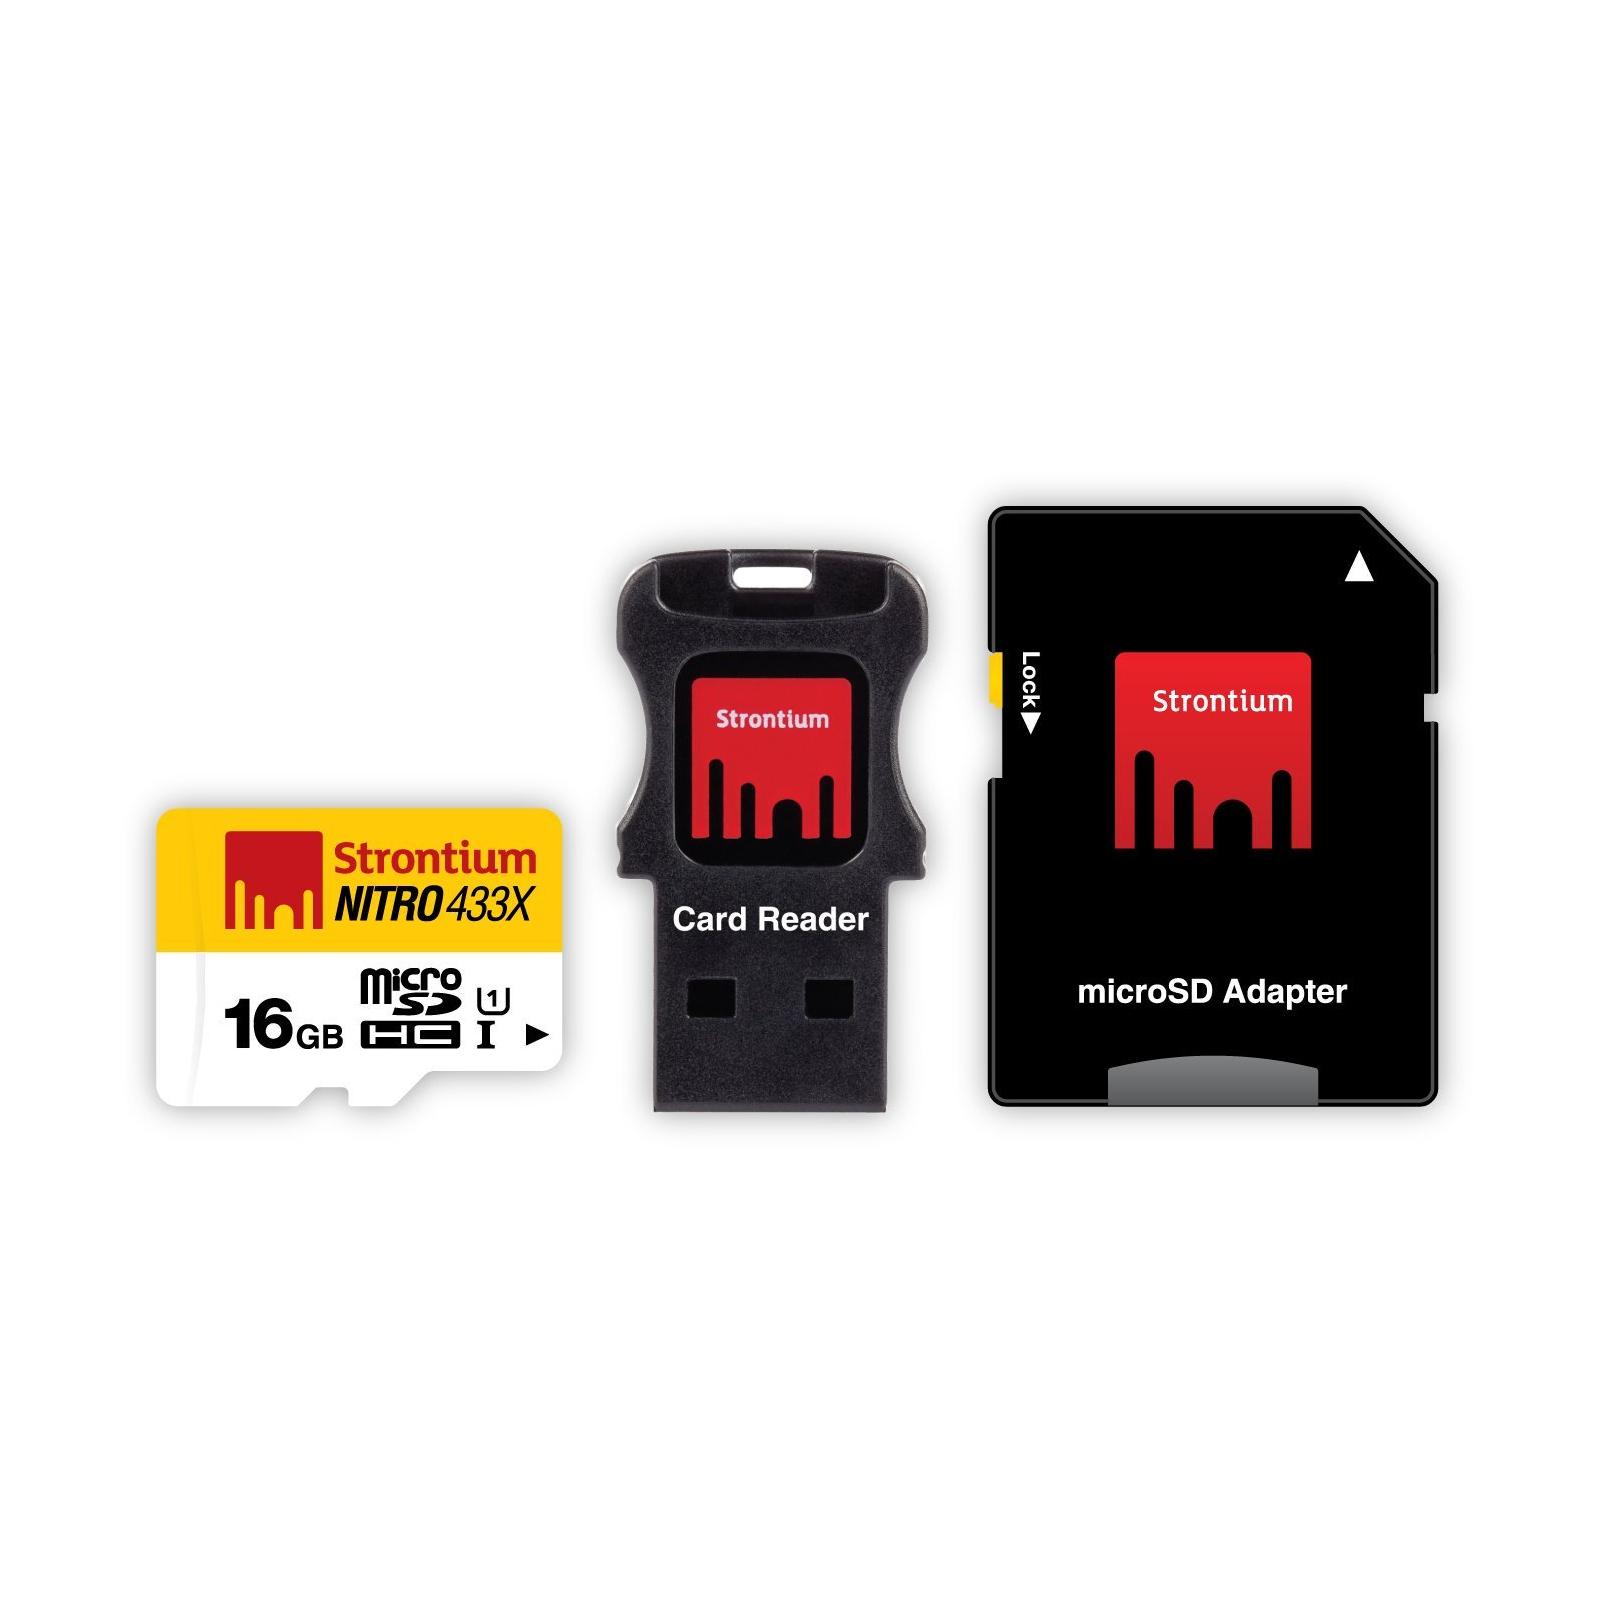 Карта памяти STRONTIUM Flash 16GB microSDHC Class 10 USH-I 433X (SRN16GTFU1C)